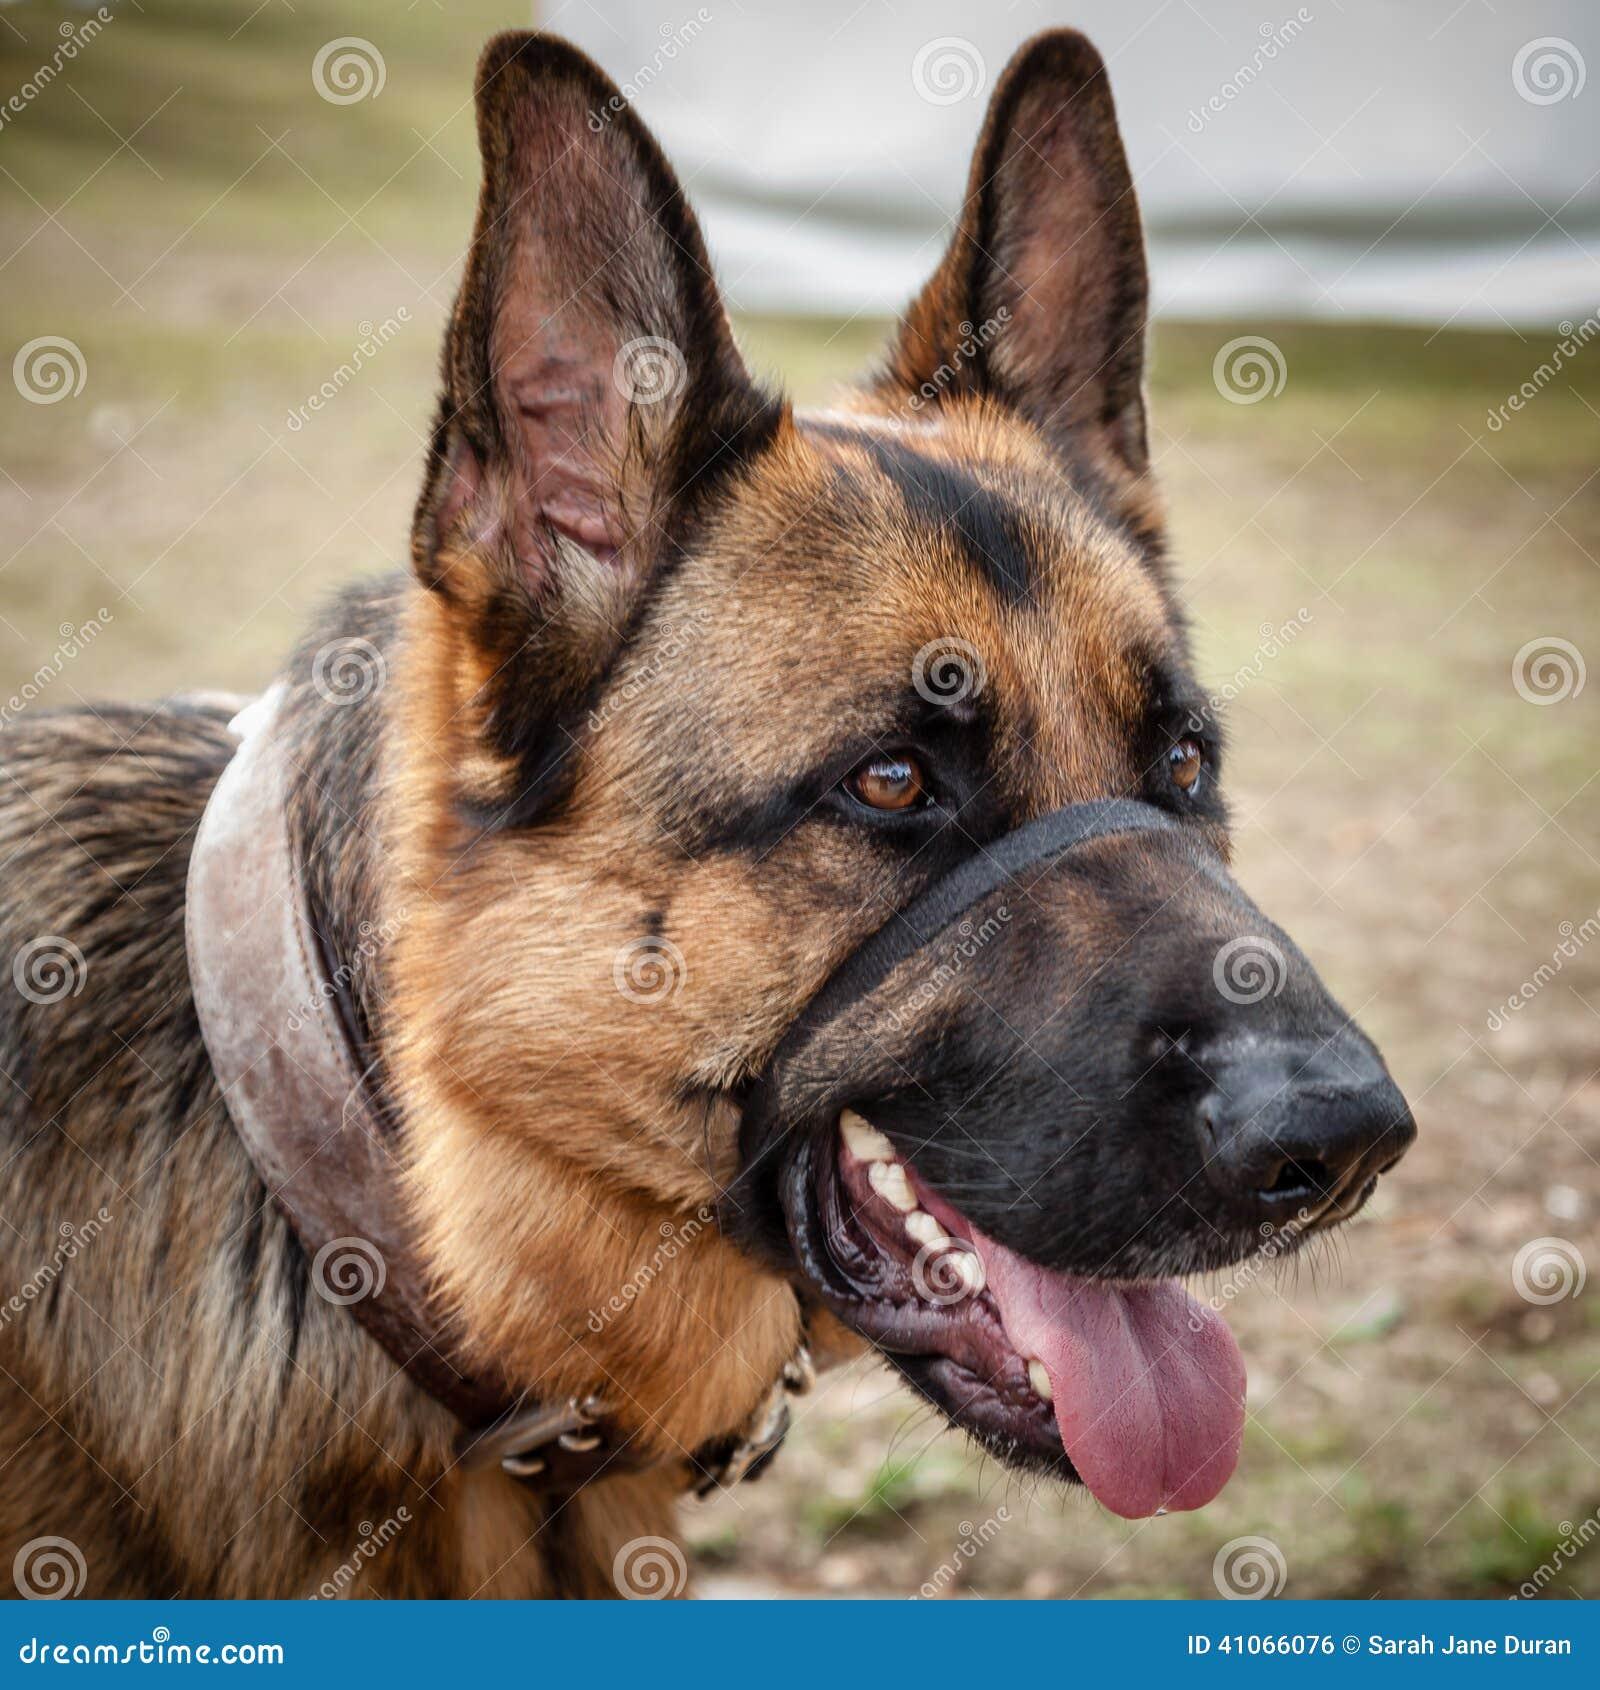 Types Of Dog Head Collars